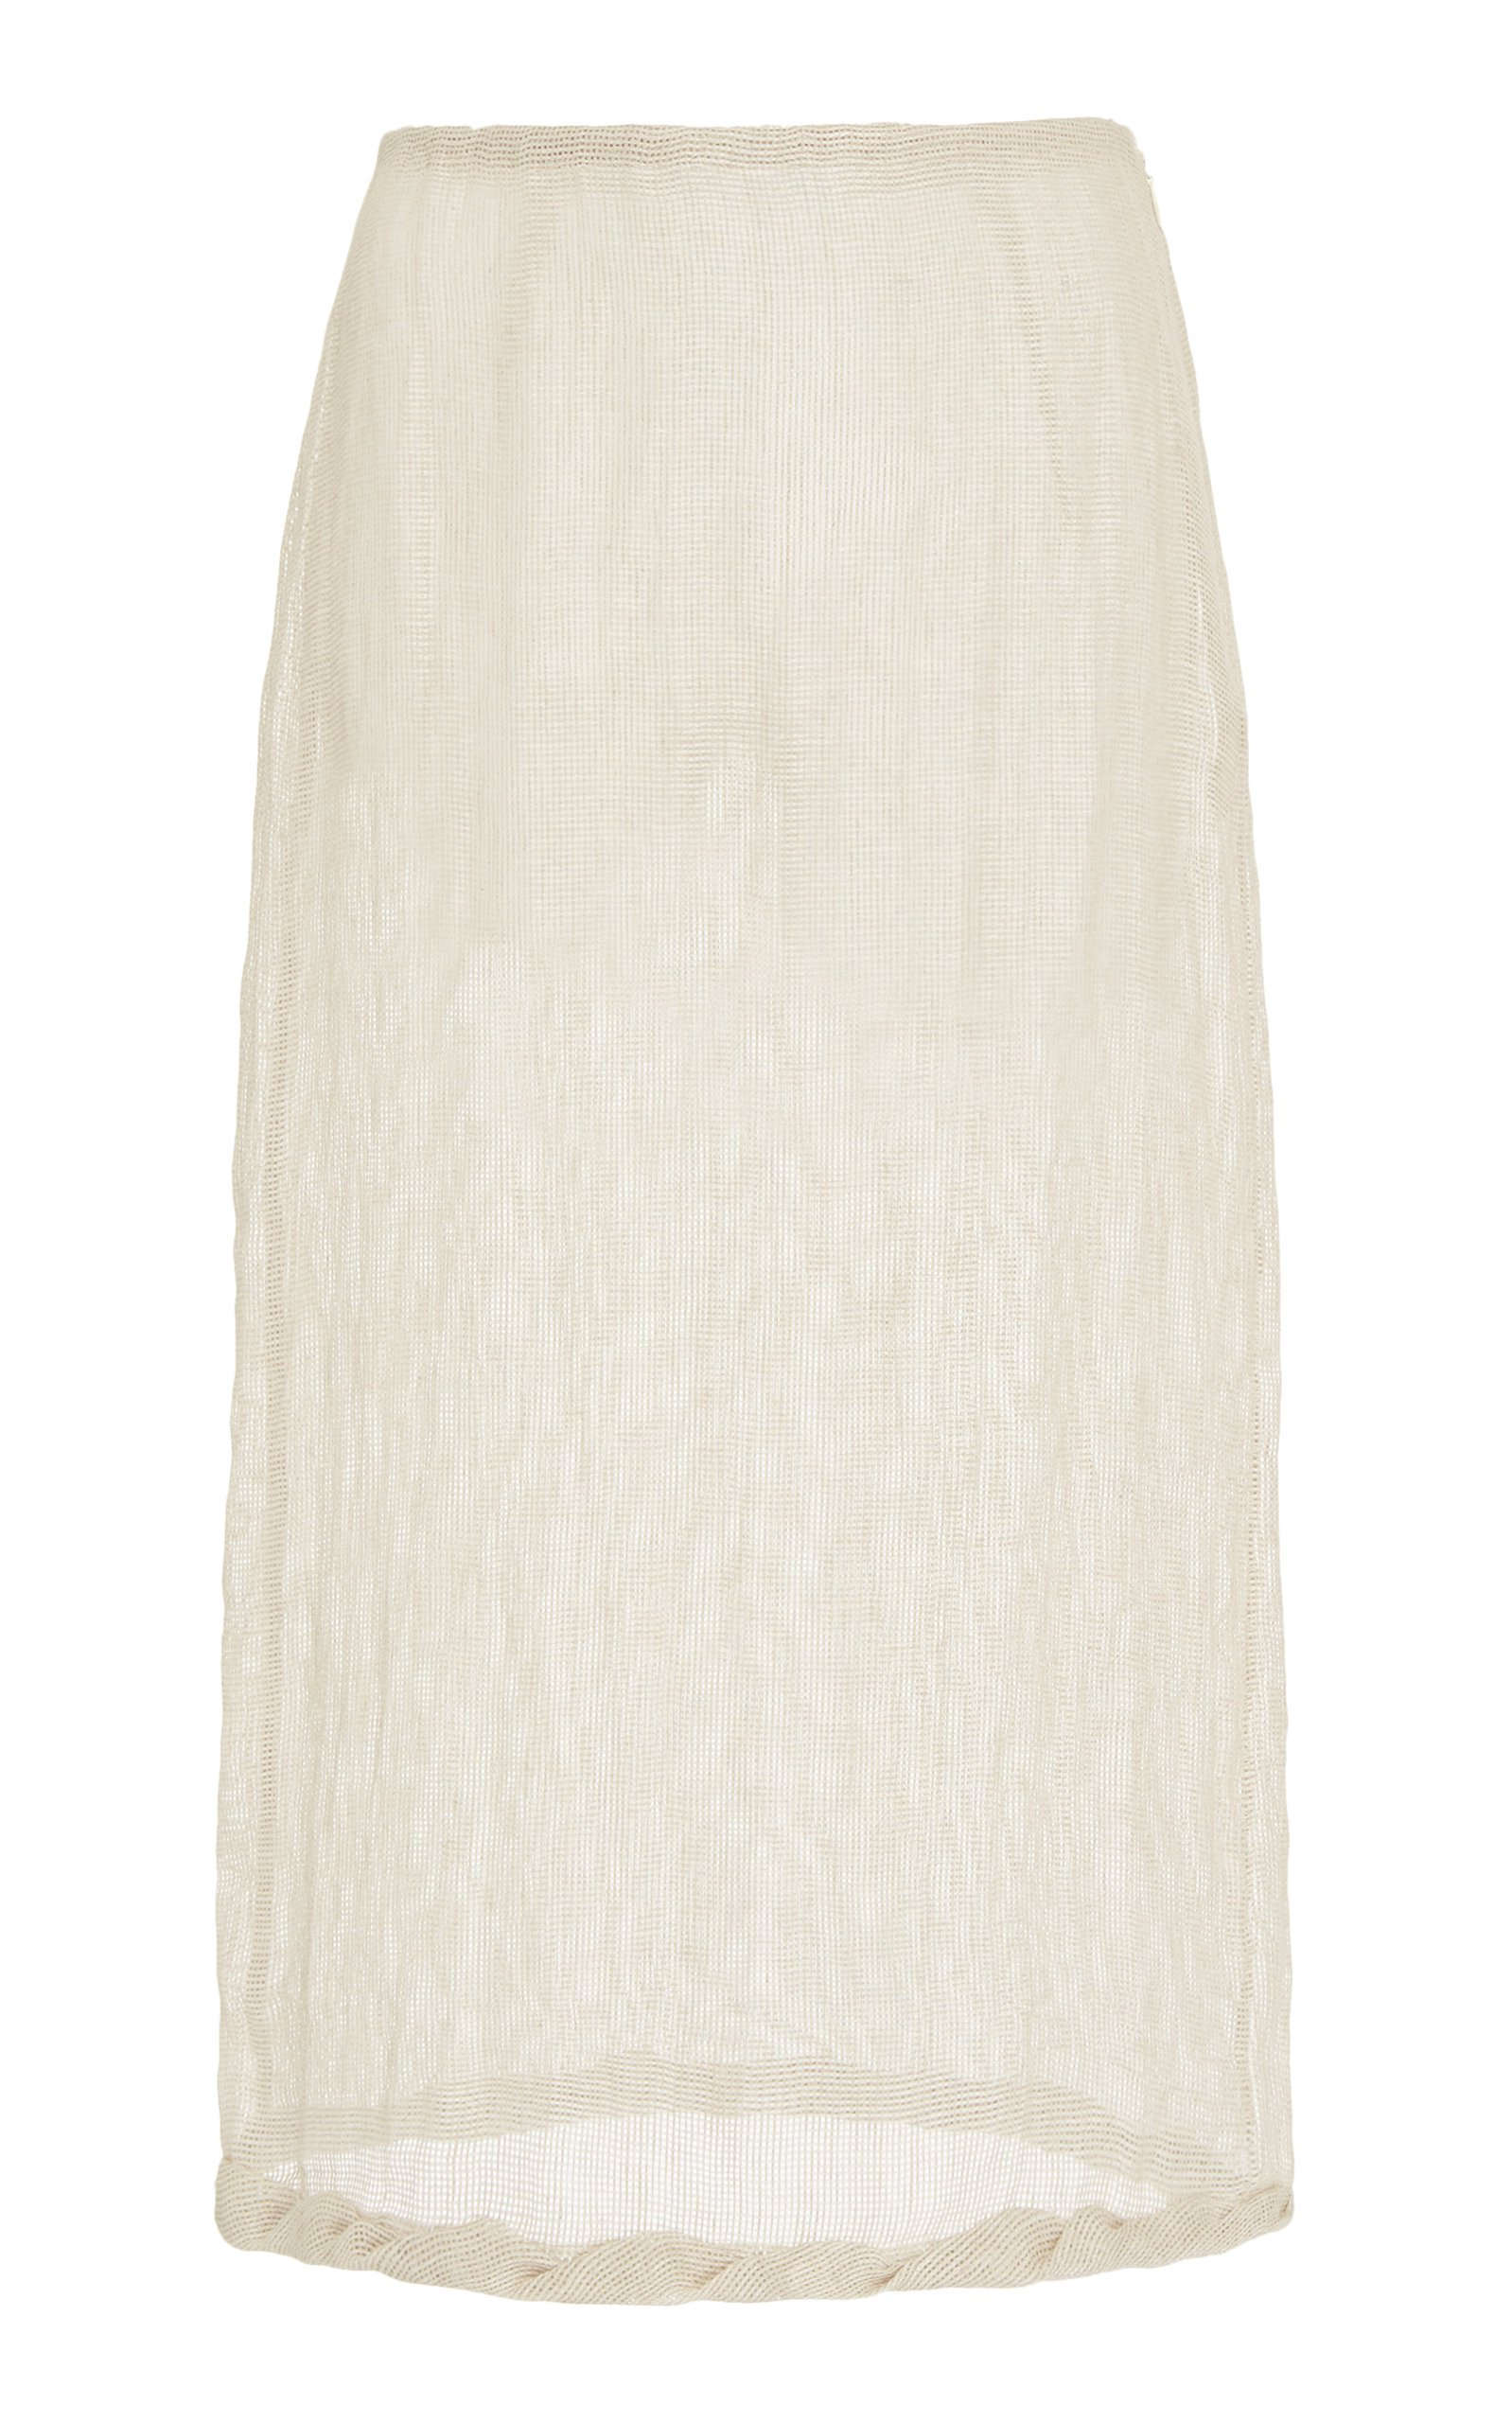 Rejina Pyo Dani Linen Voile Pencil Skirt Size: 10